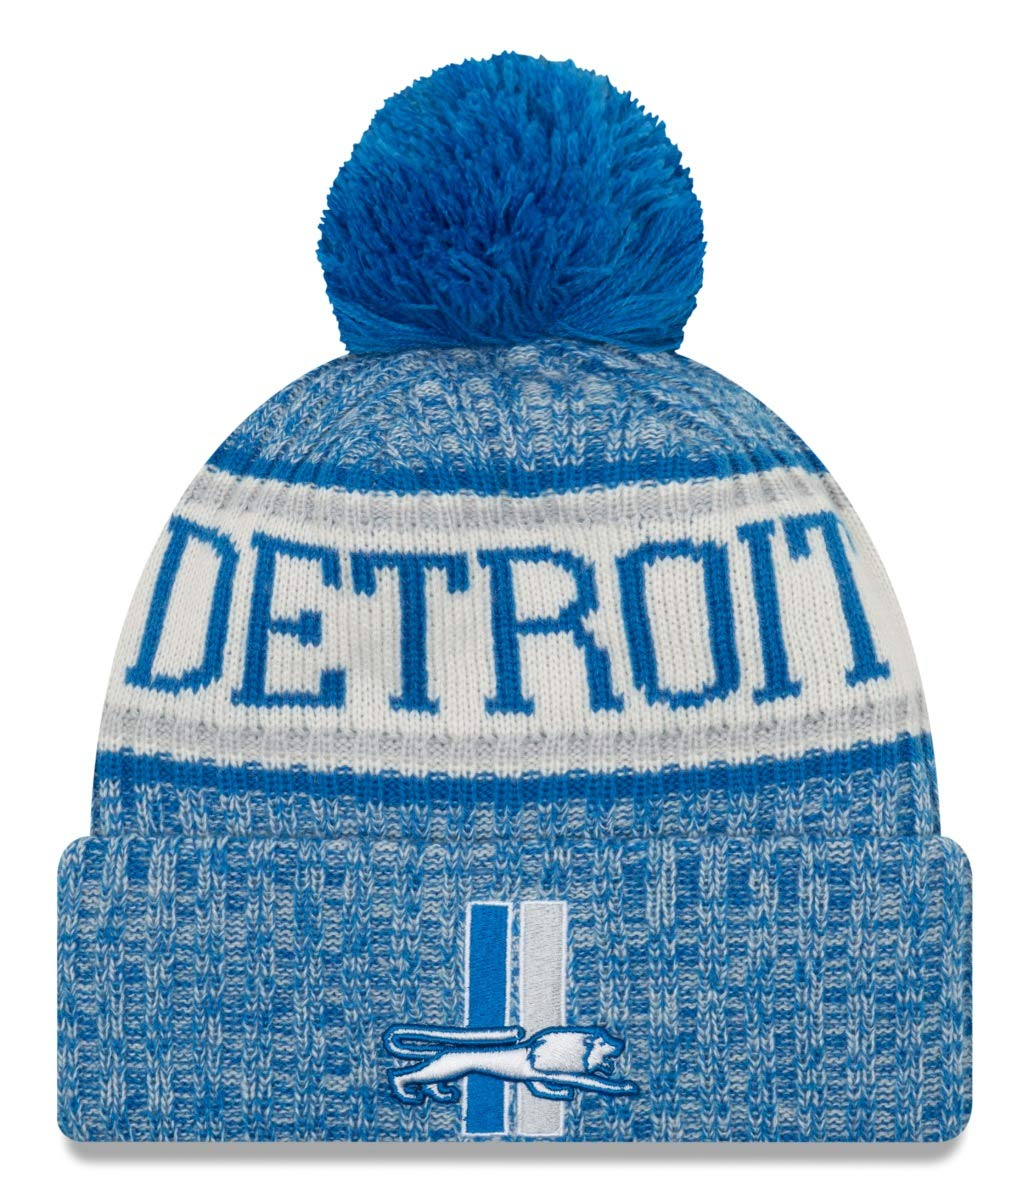 New Era Detroit Lions 2018 NFL Sideline On Field Historic Sport Knit Hat